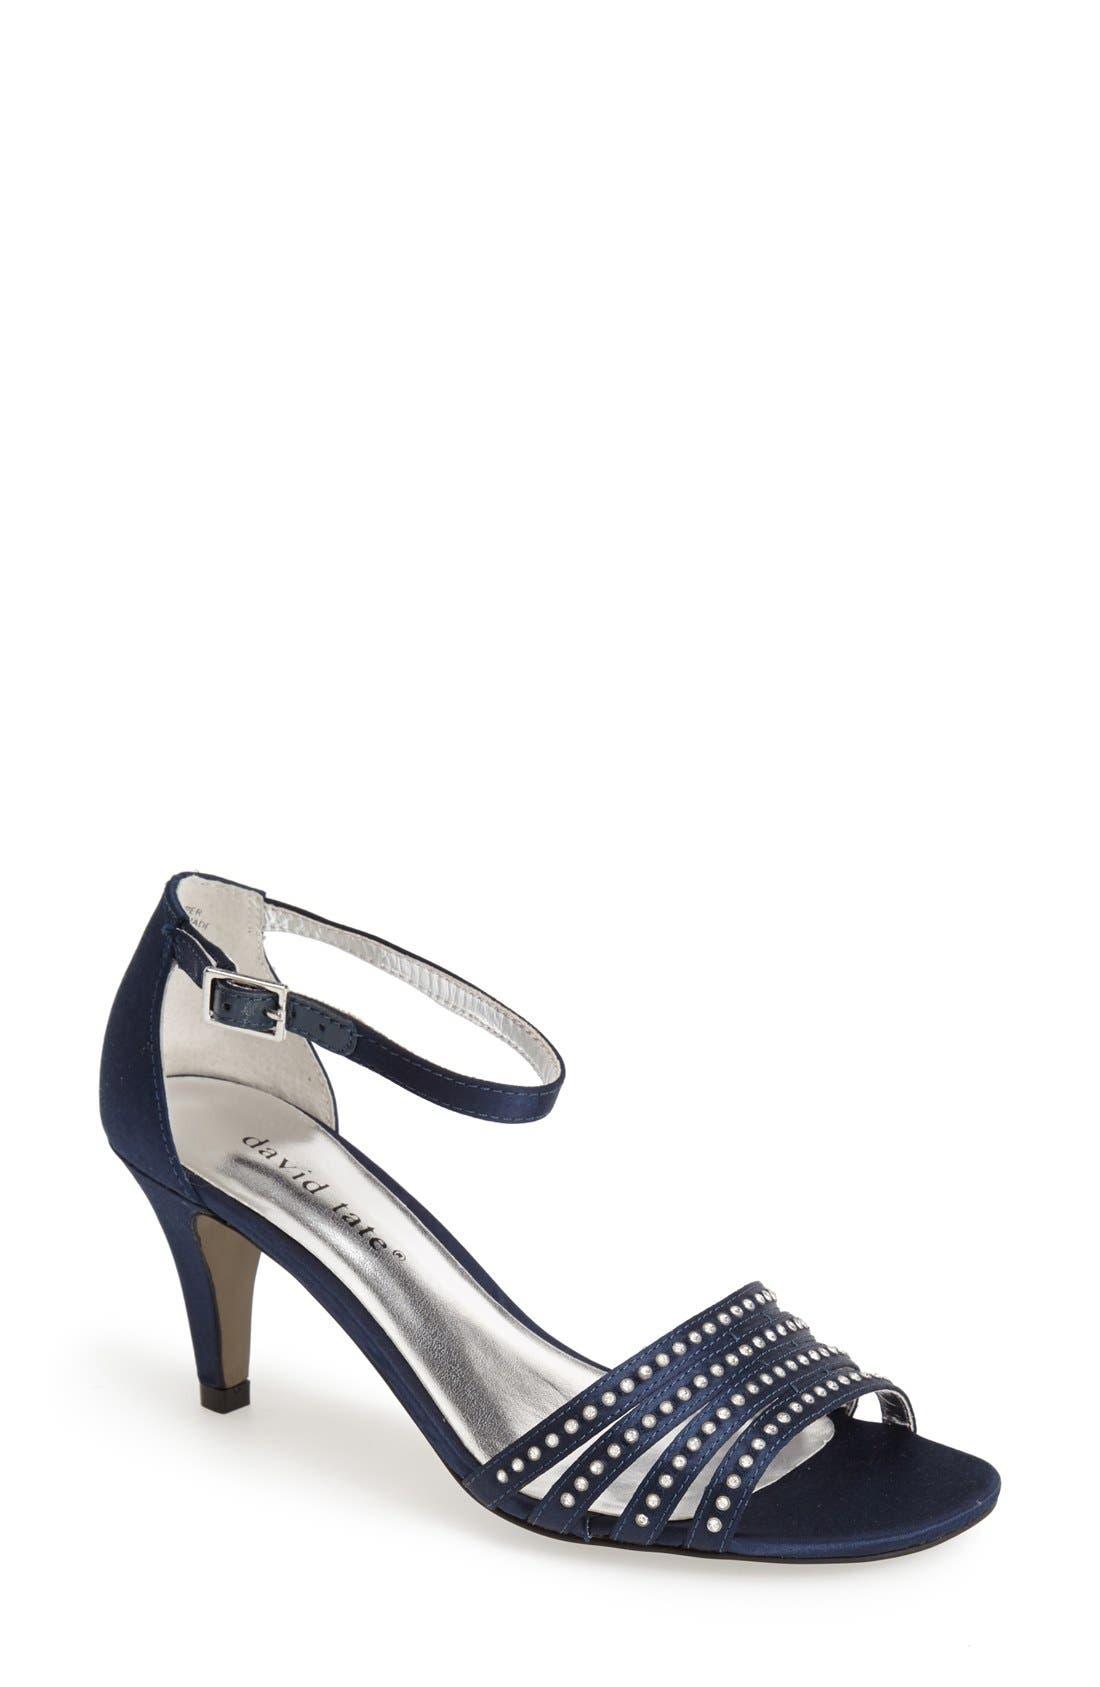 'Terra' Ankle Strap Sandal,                         Main,                         color, Navy Satin